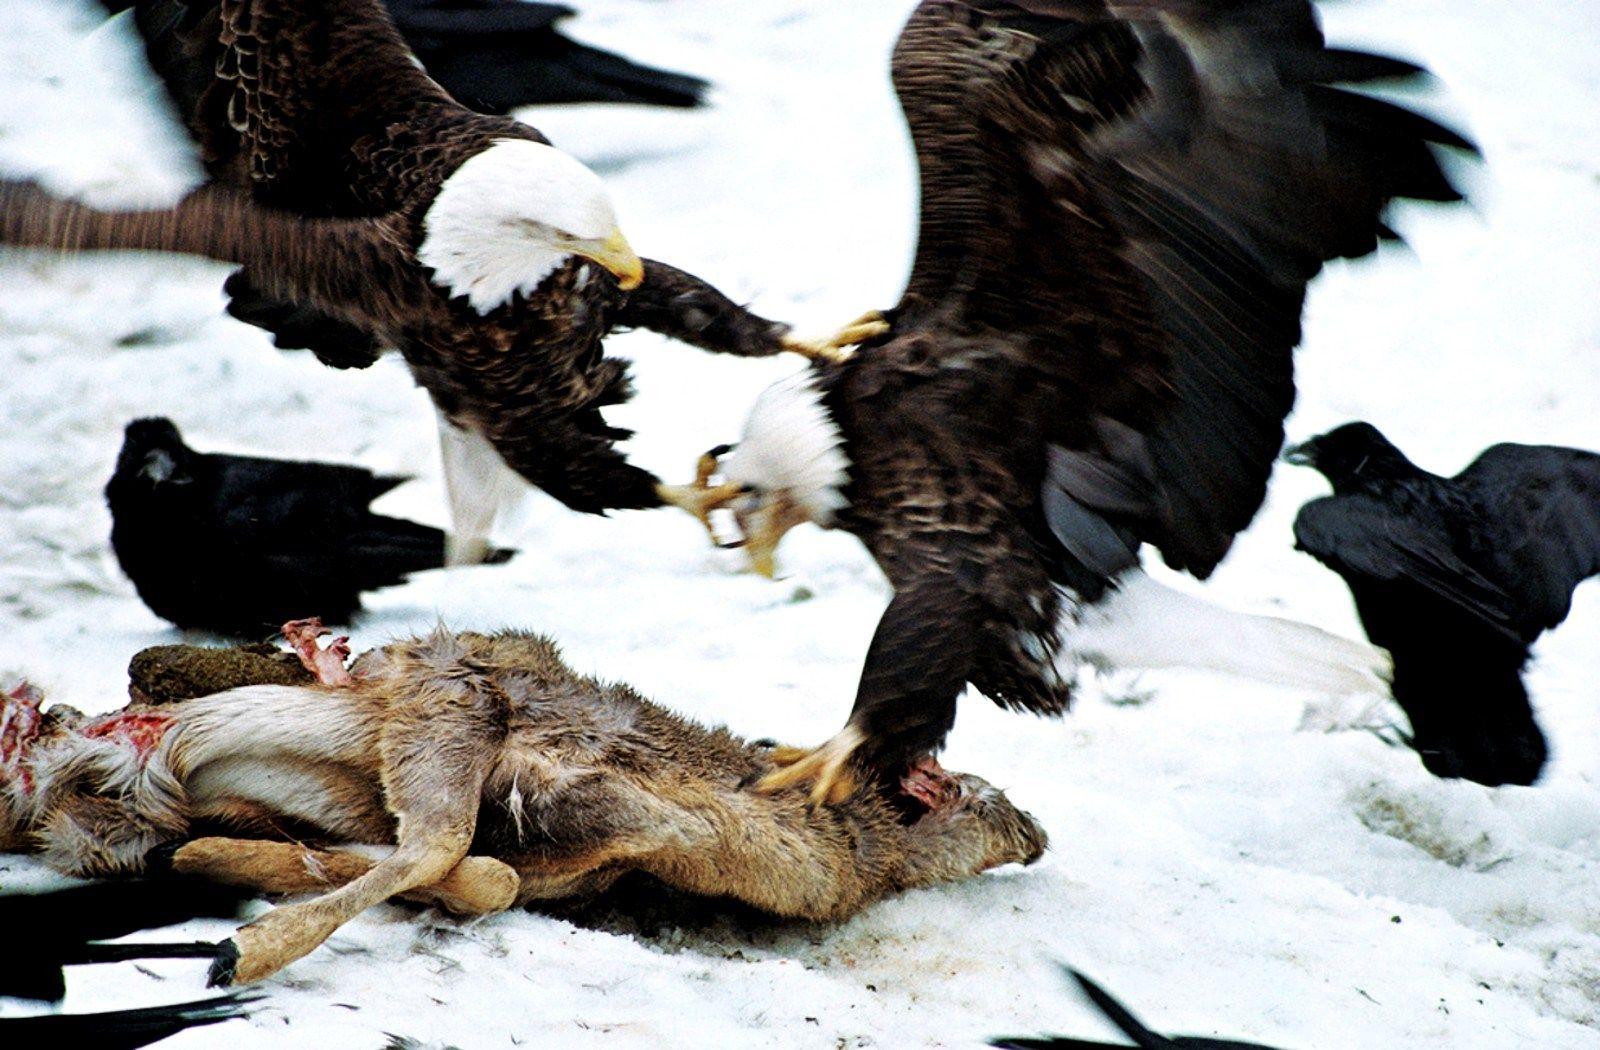 free desktop wallpaper downloads eagle, 322 kB Osborn